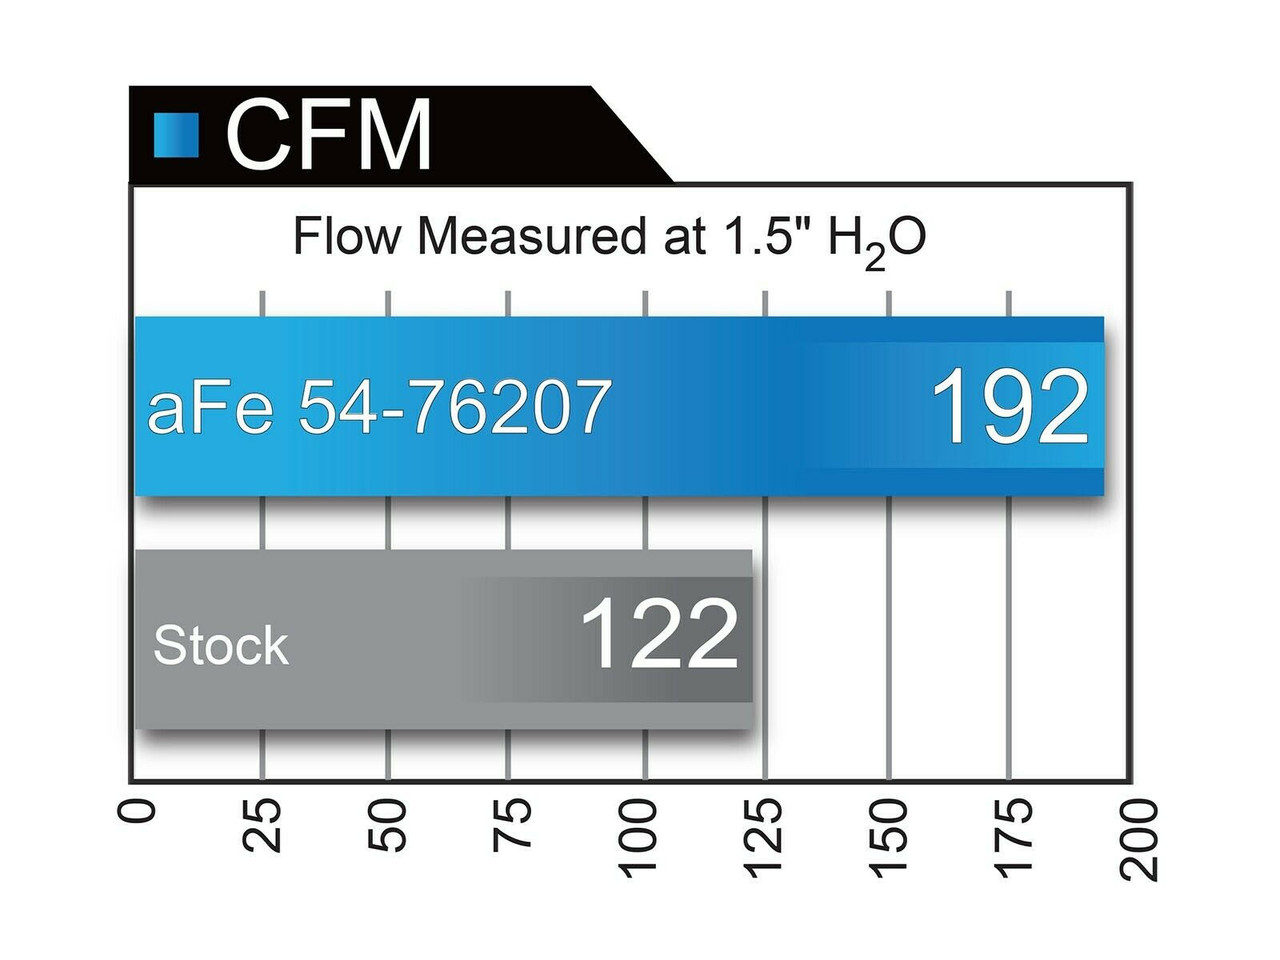 AFE AIR INTAKE FOR 2011-2015 JEEP GRAND CHEROKEE 3.6L WK2 DODGE DURANGO 54-76207